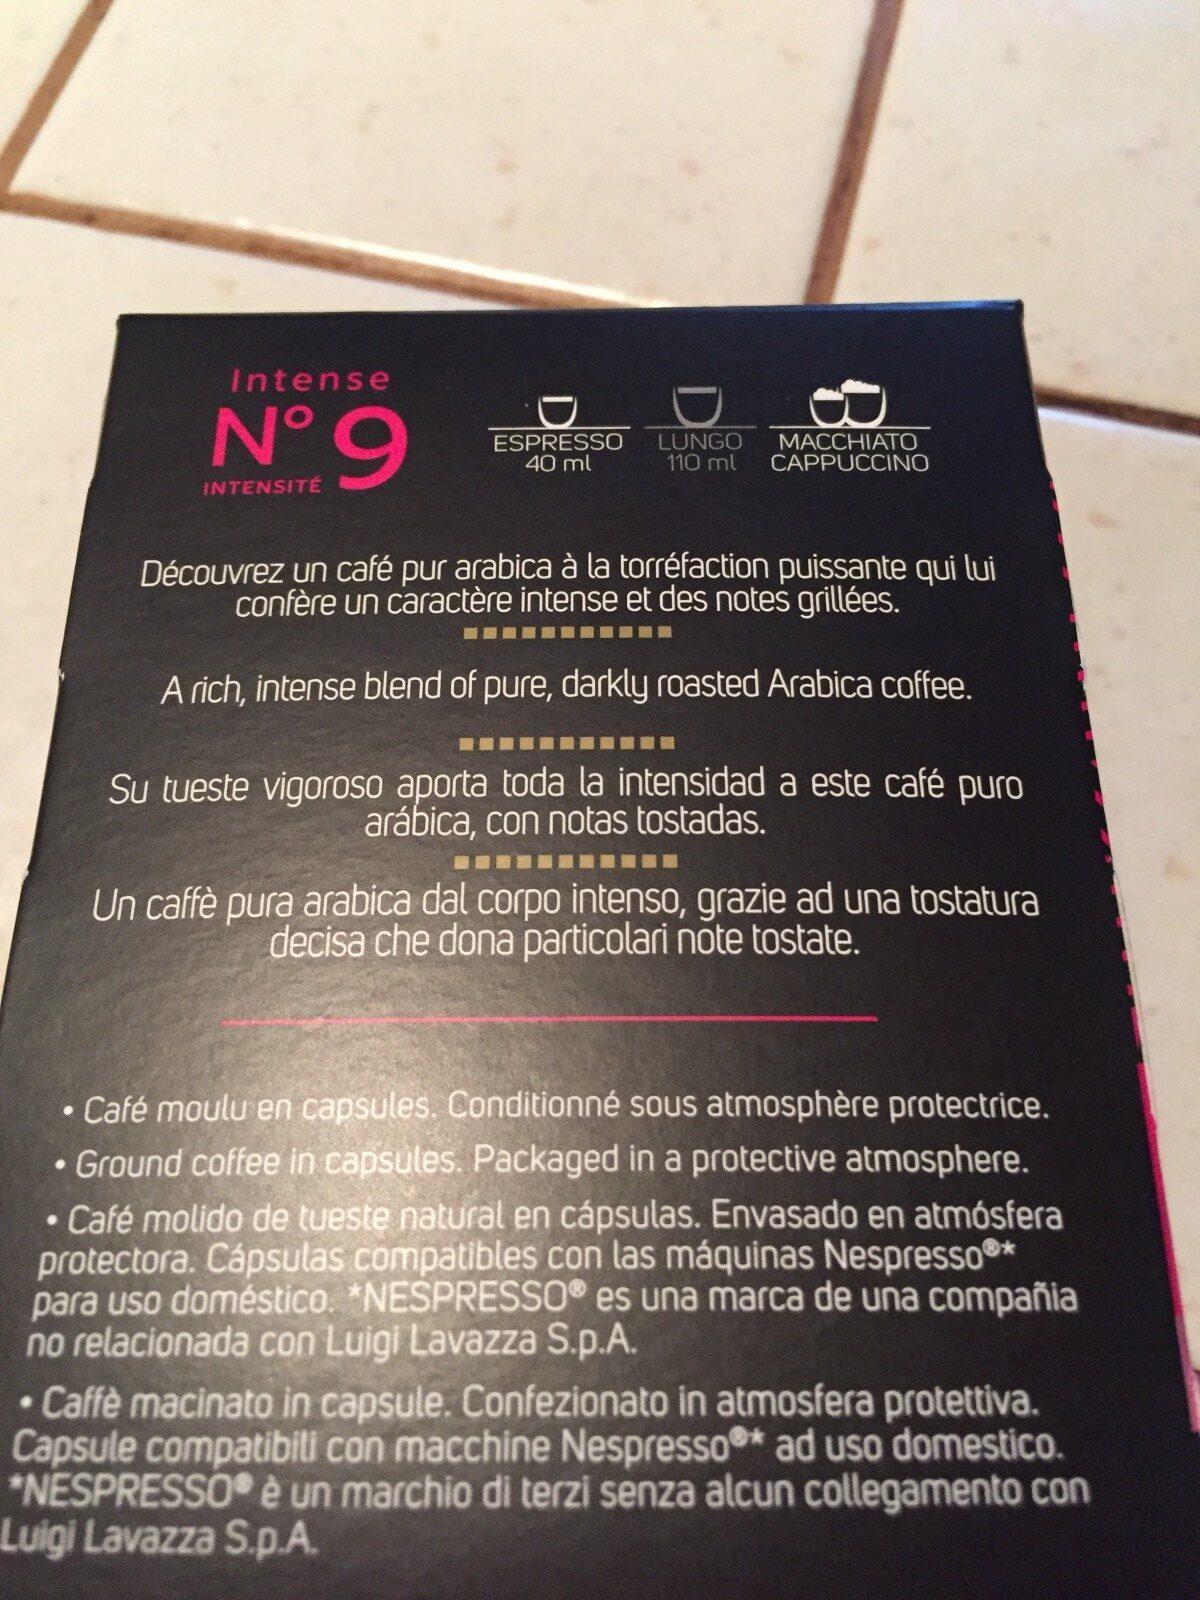 Café capsules Intense n°9 - Espresso - Ingredients - fr